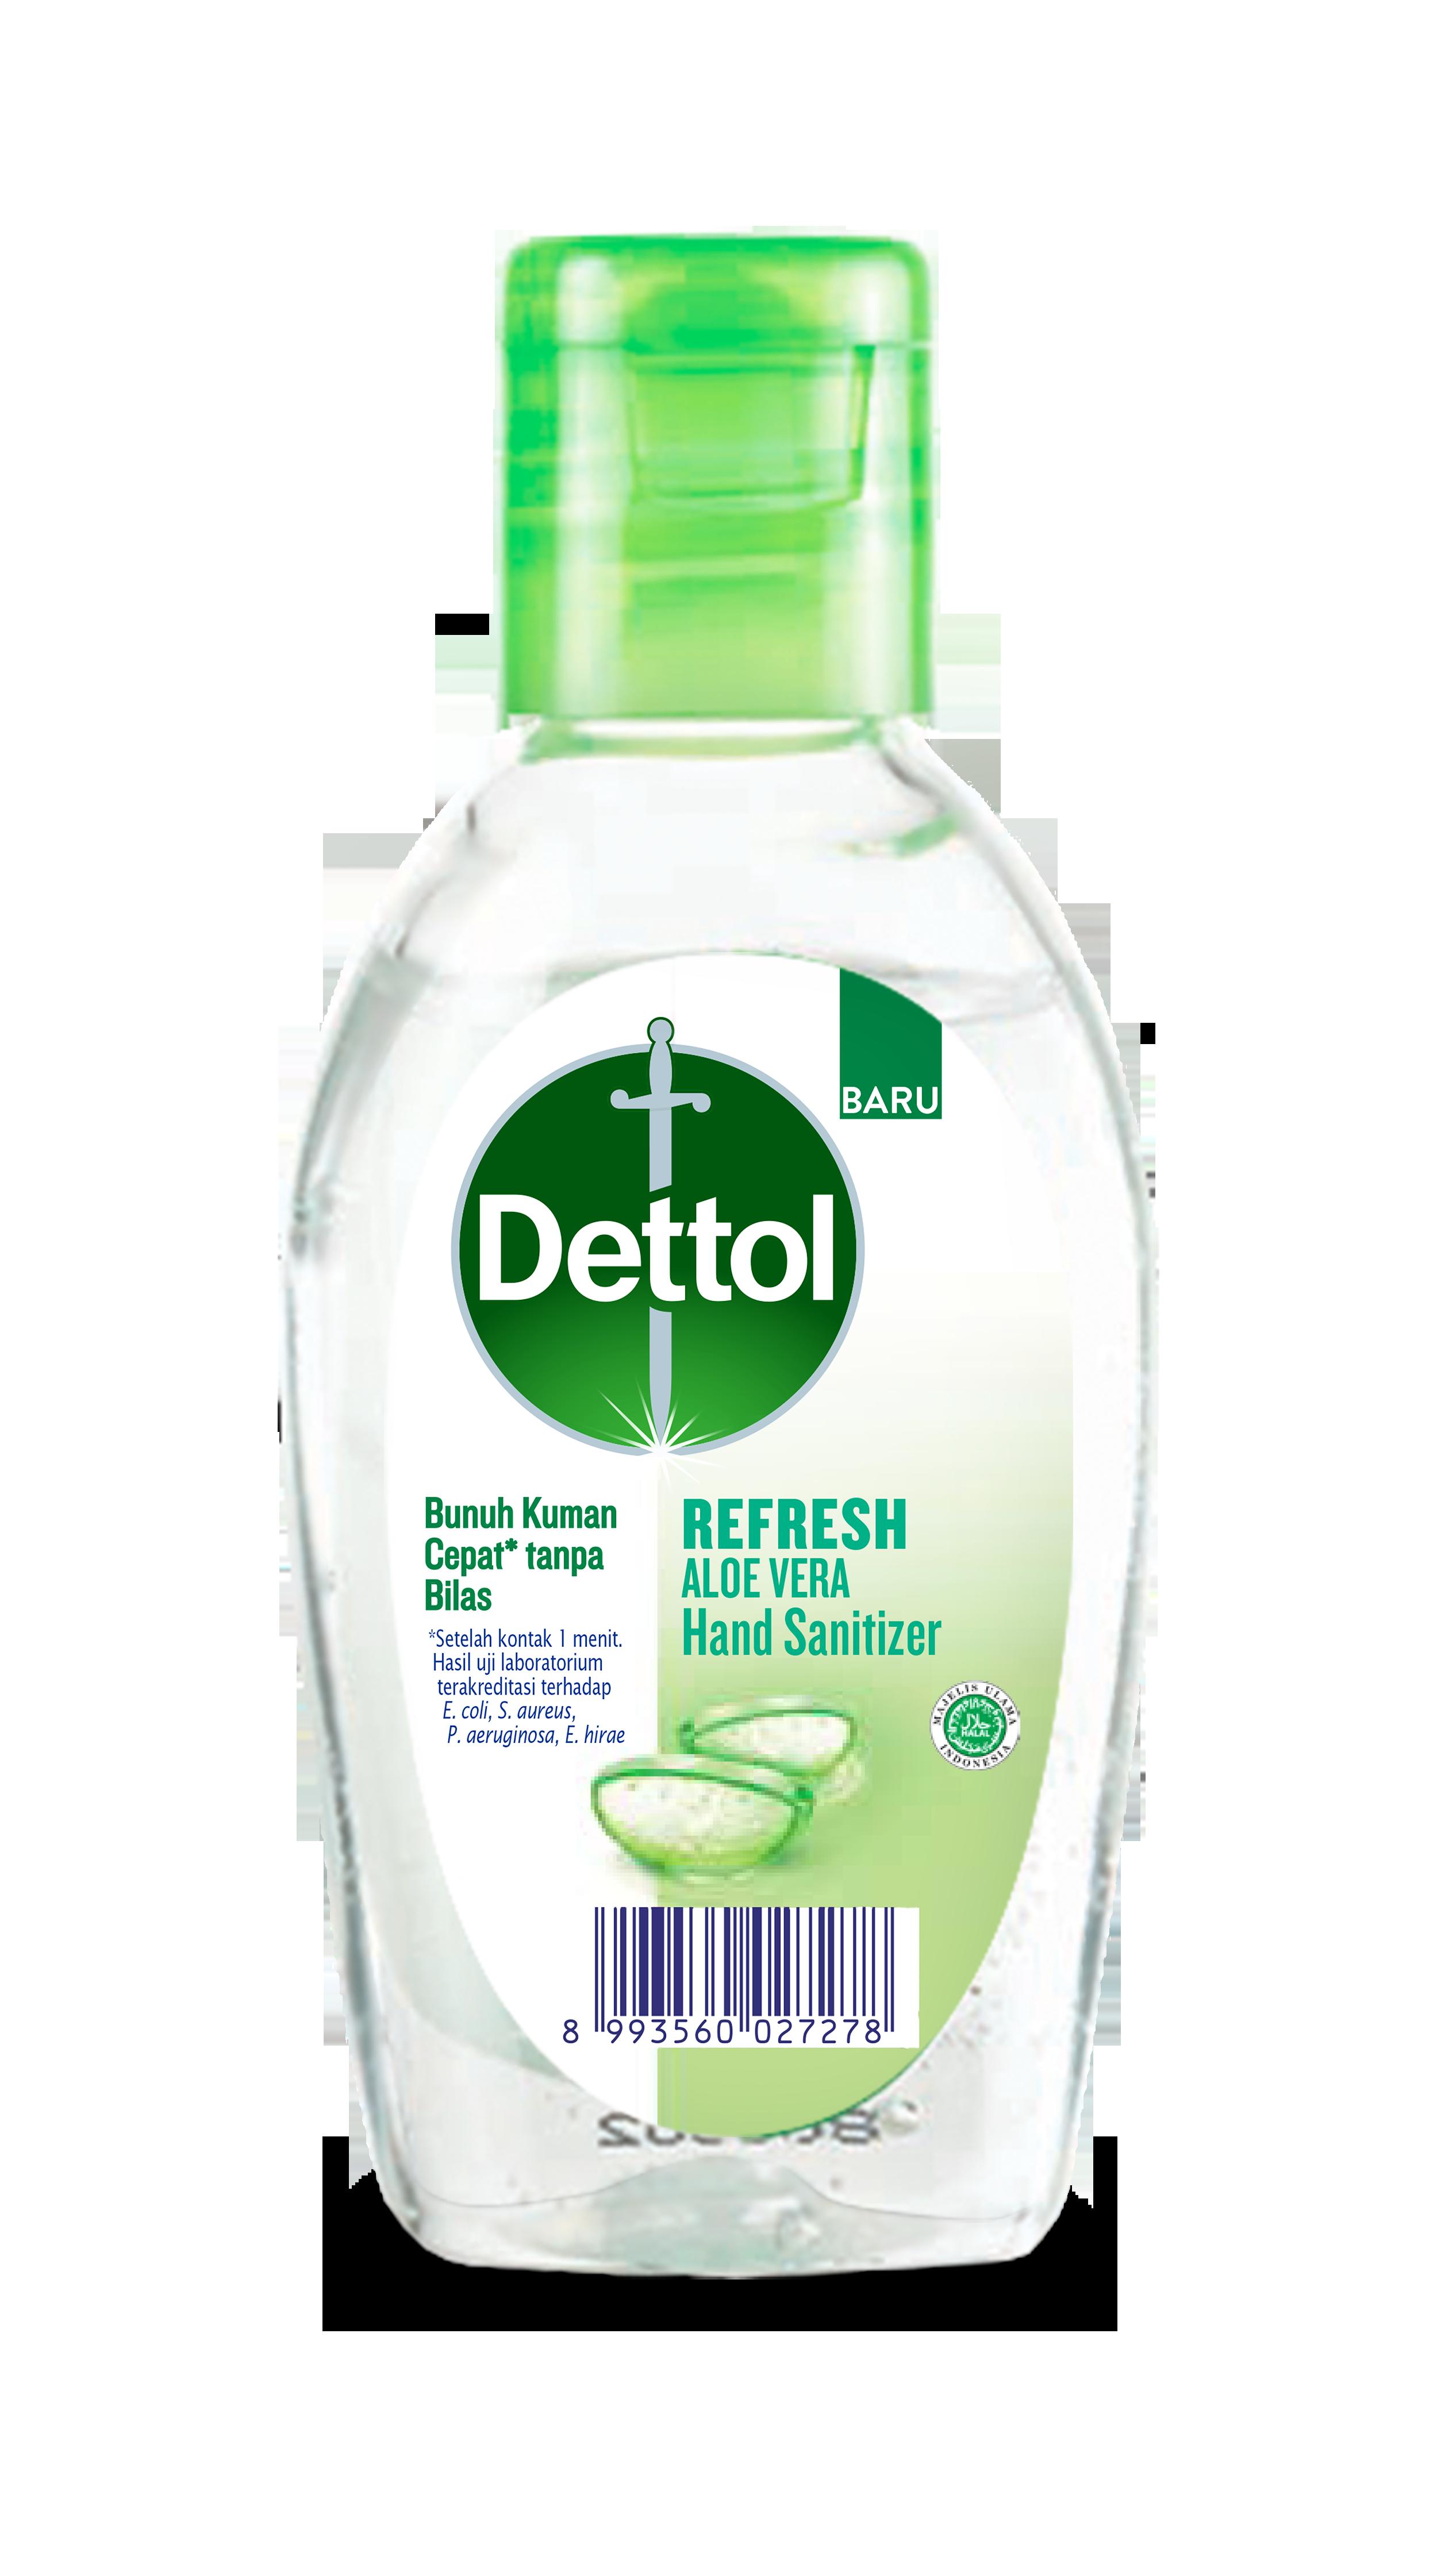 Dettol Instant Hand Sanitizer Refresh